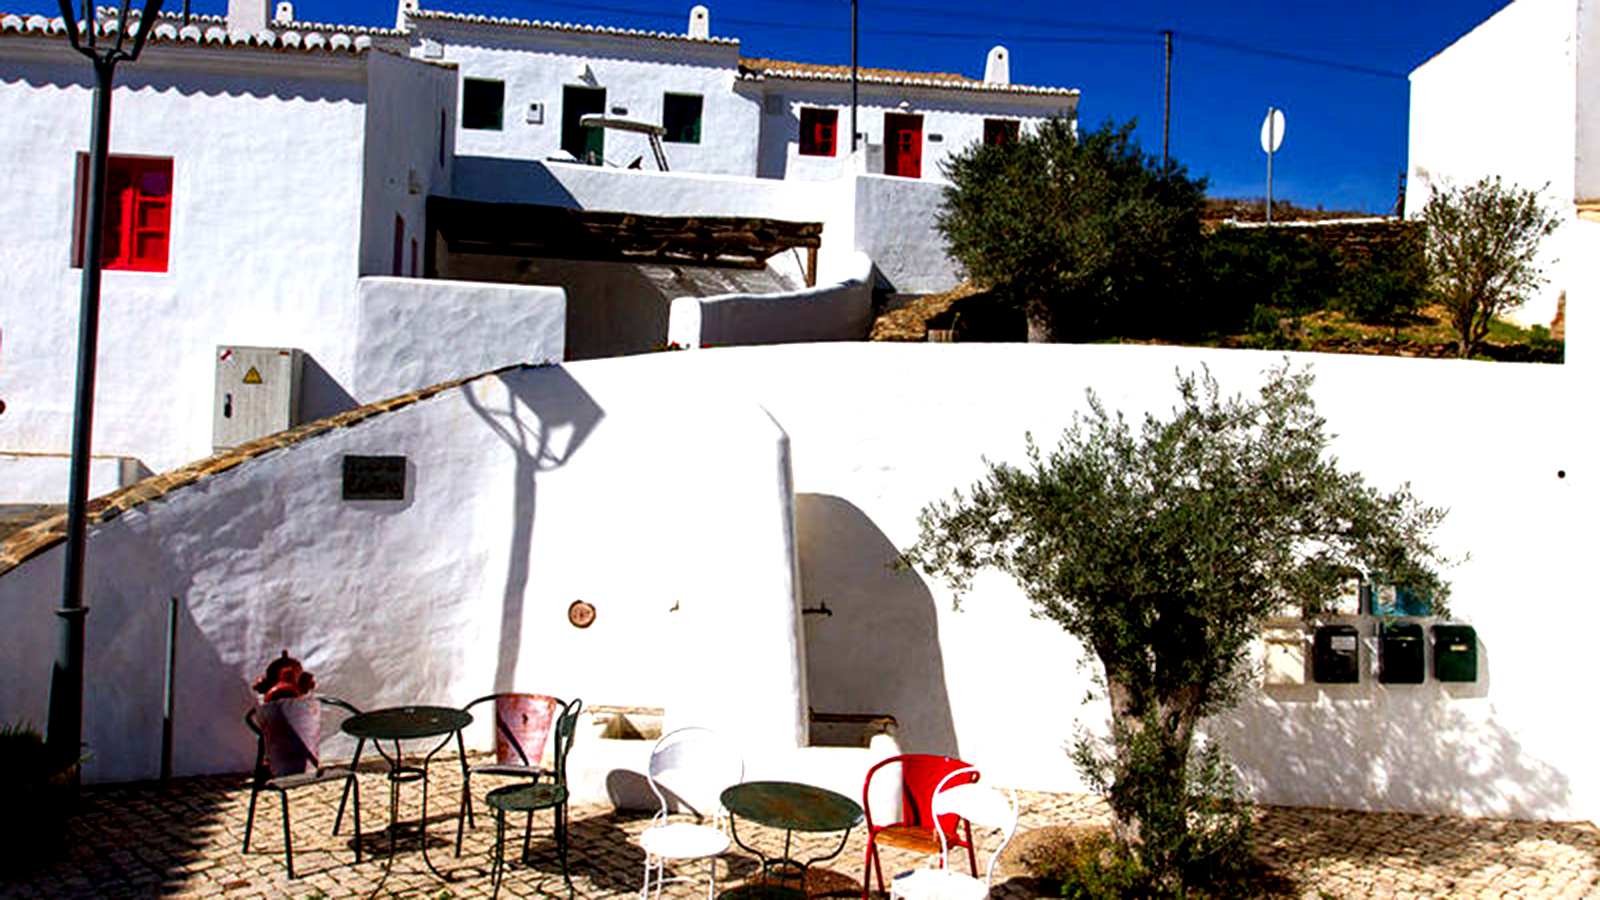 aldeia-da-pedralva-tmo_adp228.jpg